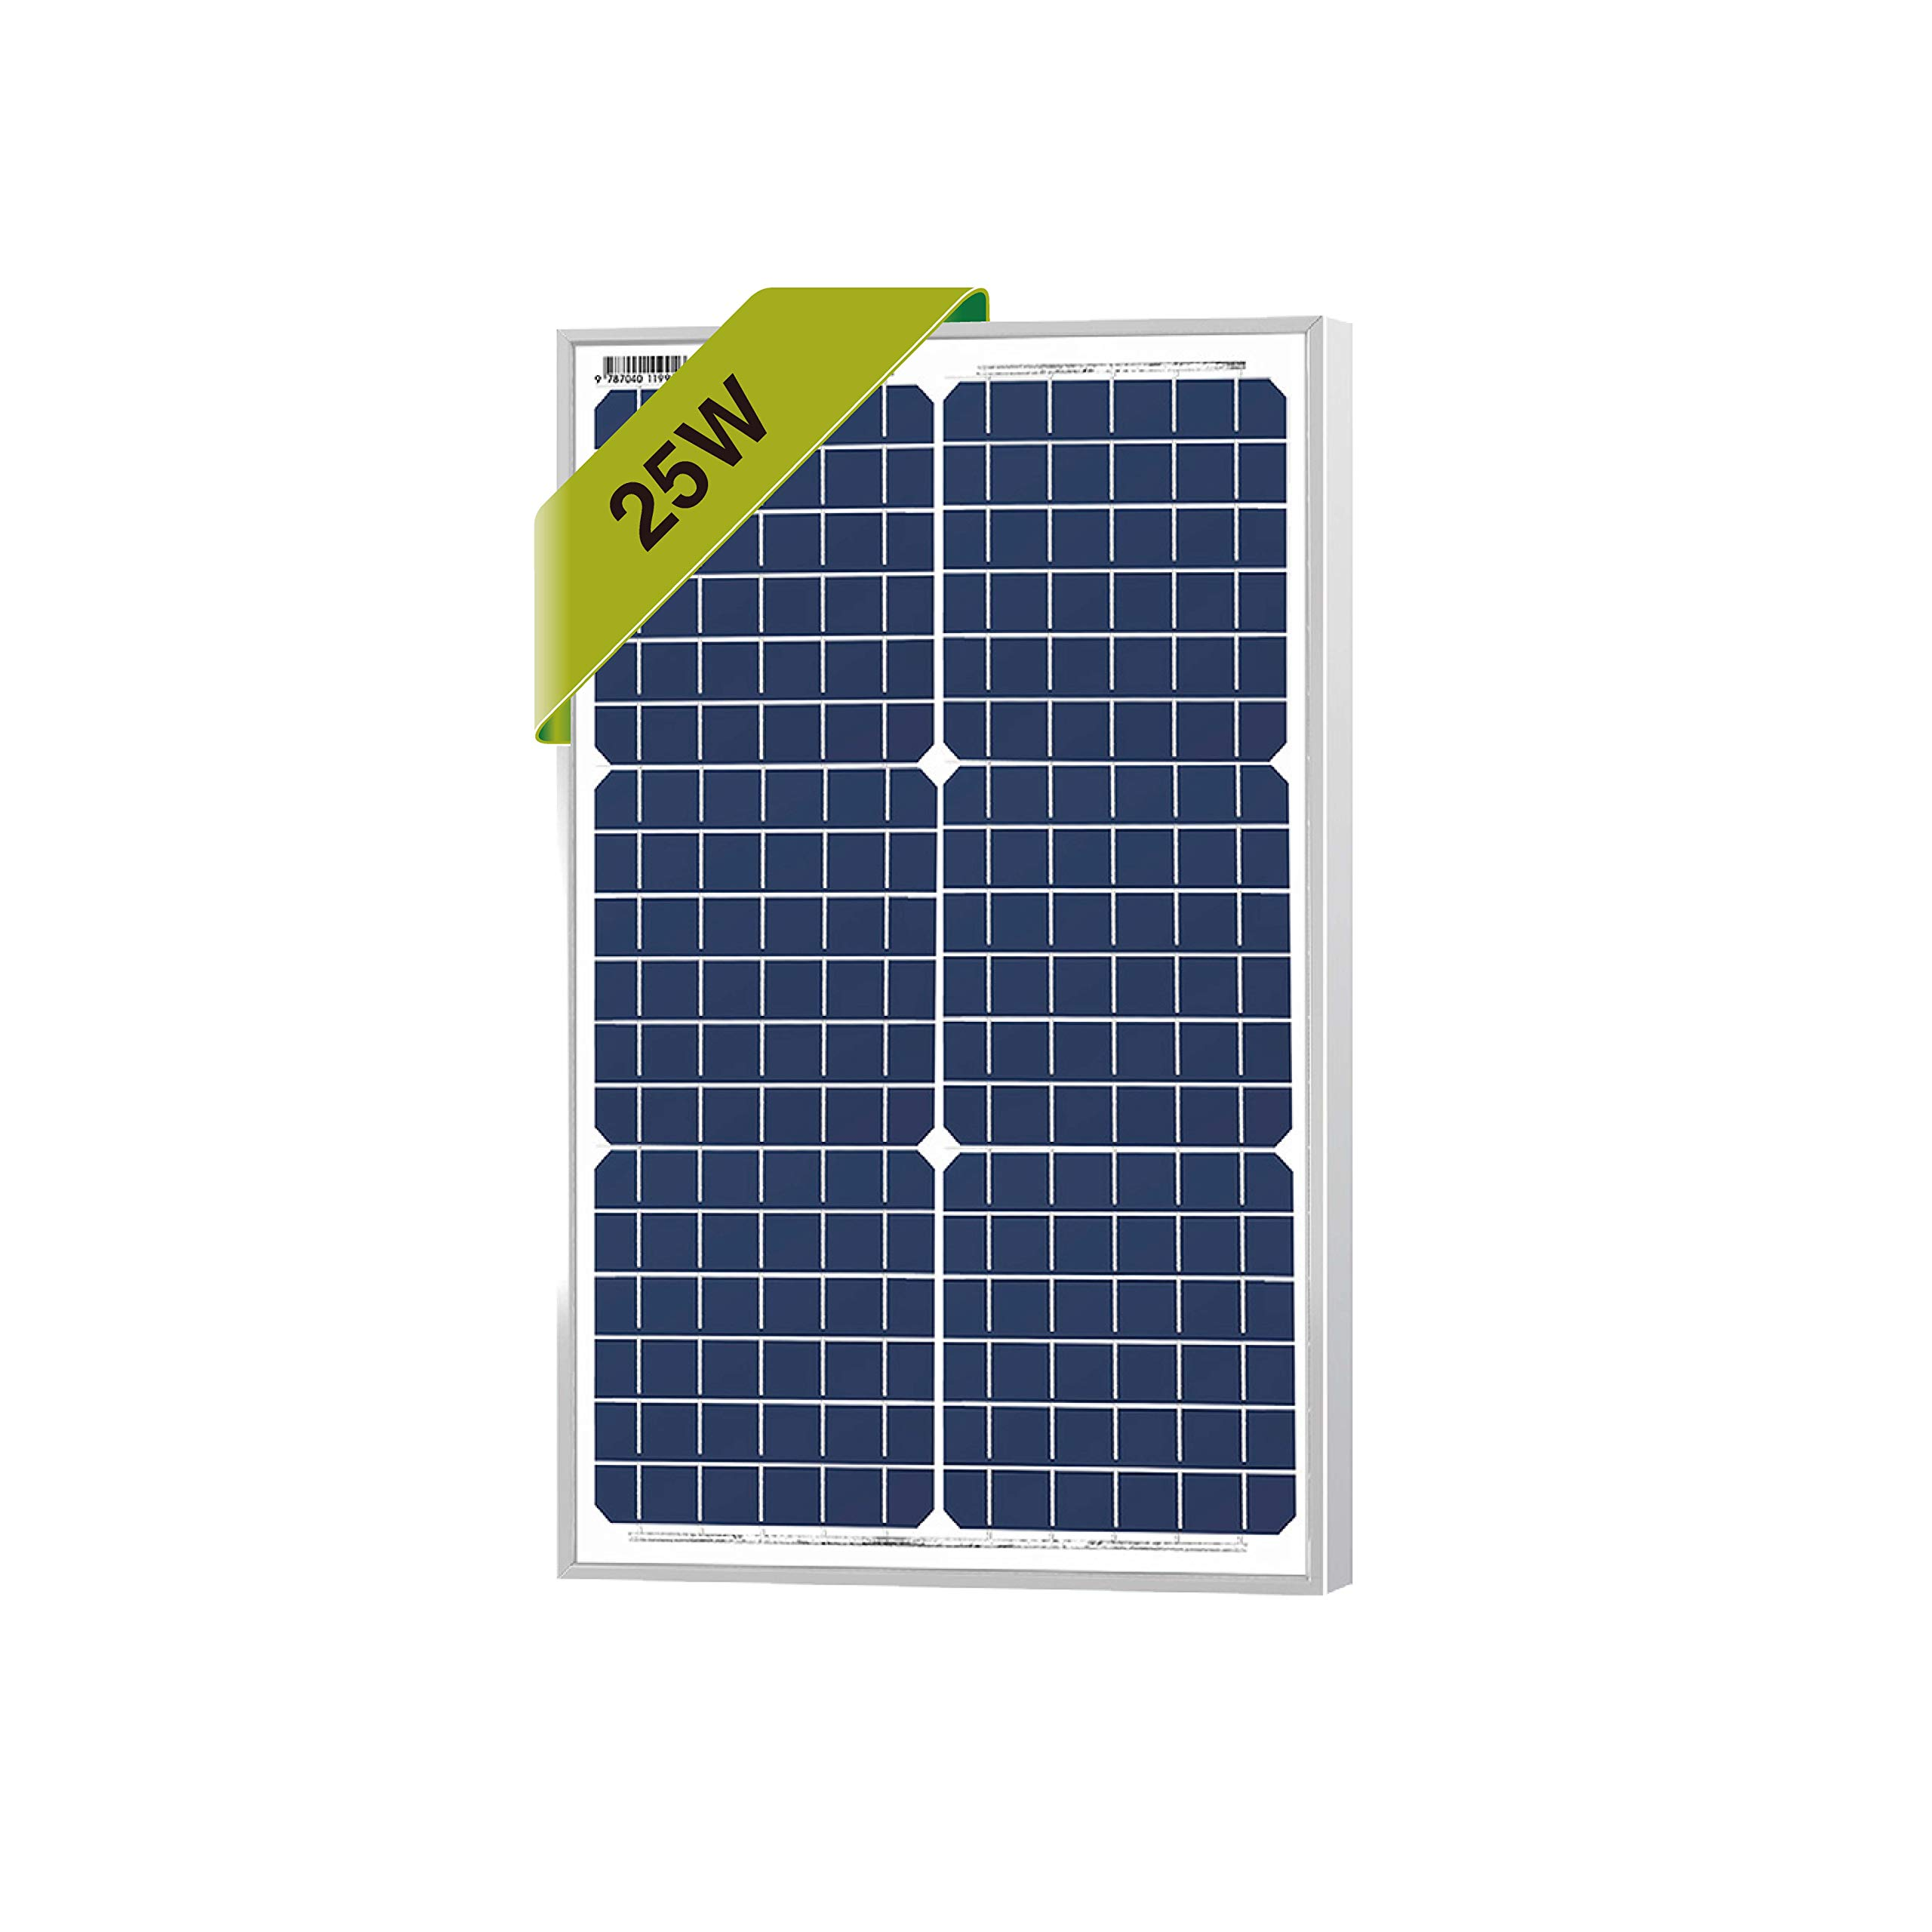 25 Watts Monocrystalline Newpowa 12v Mono Solar Panel Module 20W < 25W < 30W Rv Marine Boat Off Grid by Newpowa